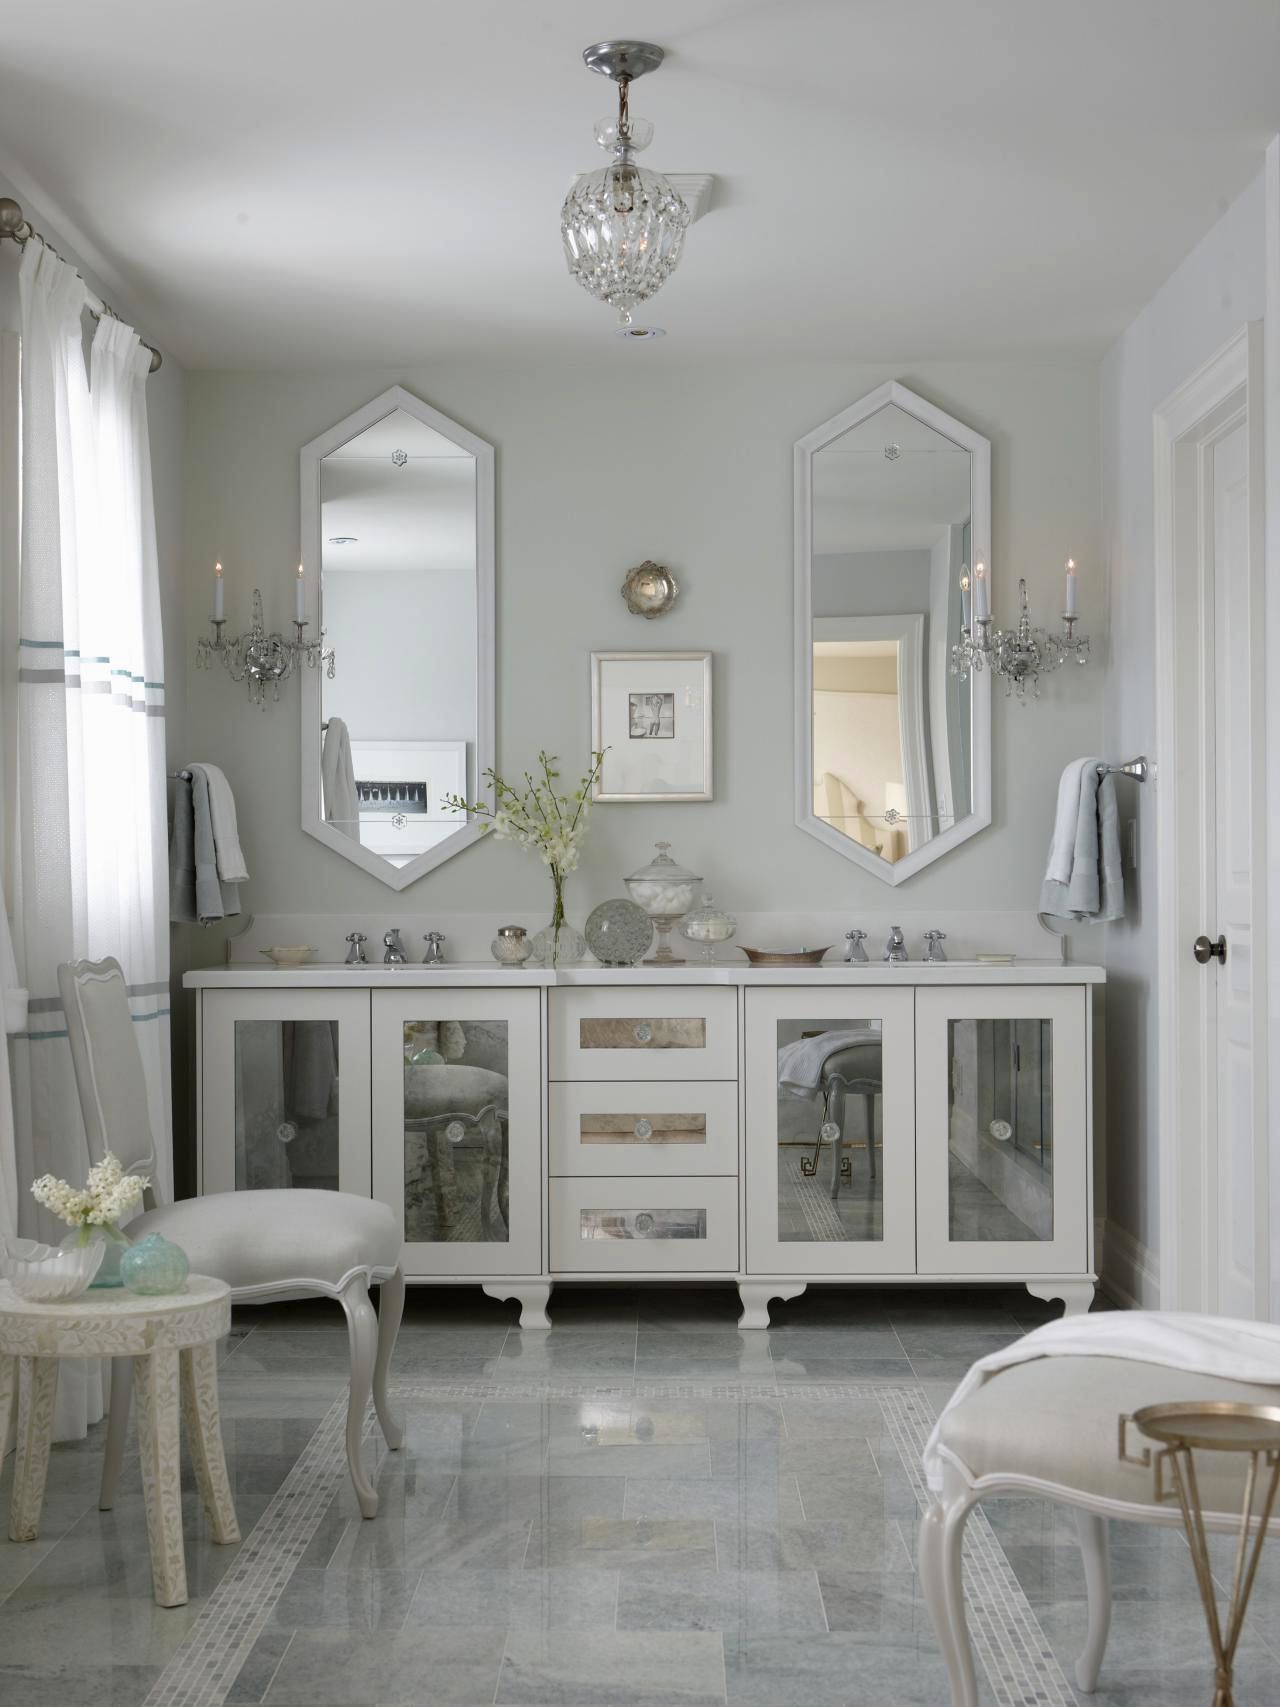 cool bathroom remodel costs inspiration-Beautiful Bathroom Remodel Costs Inspiration